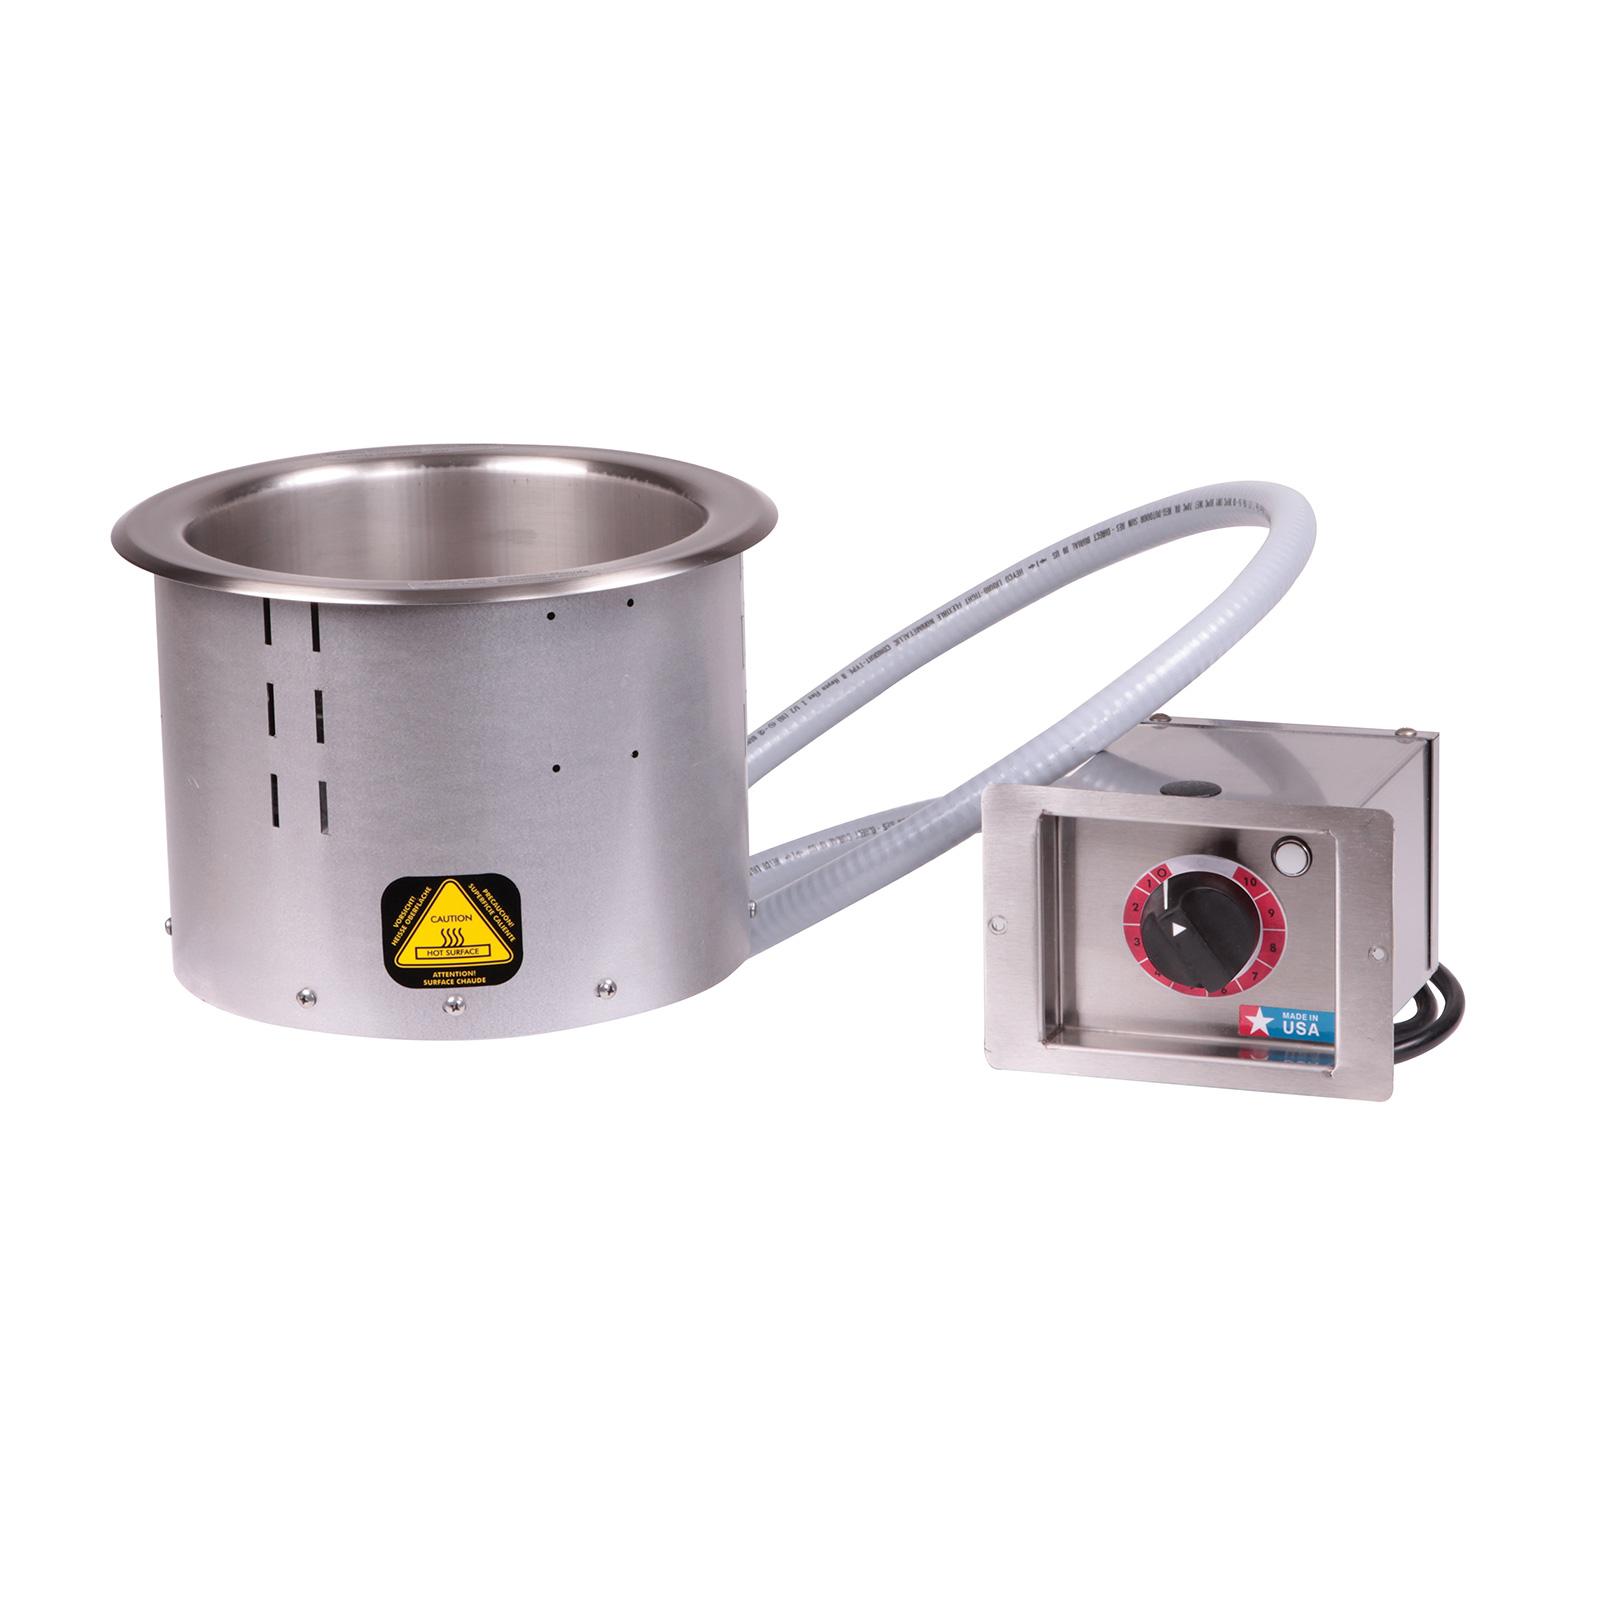 Alto-Shaam 700-RW-QS hot food well unit, drop-in, electric